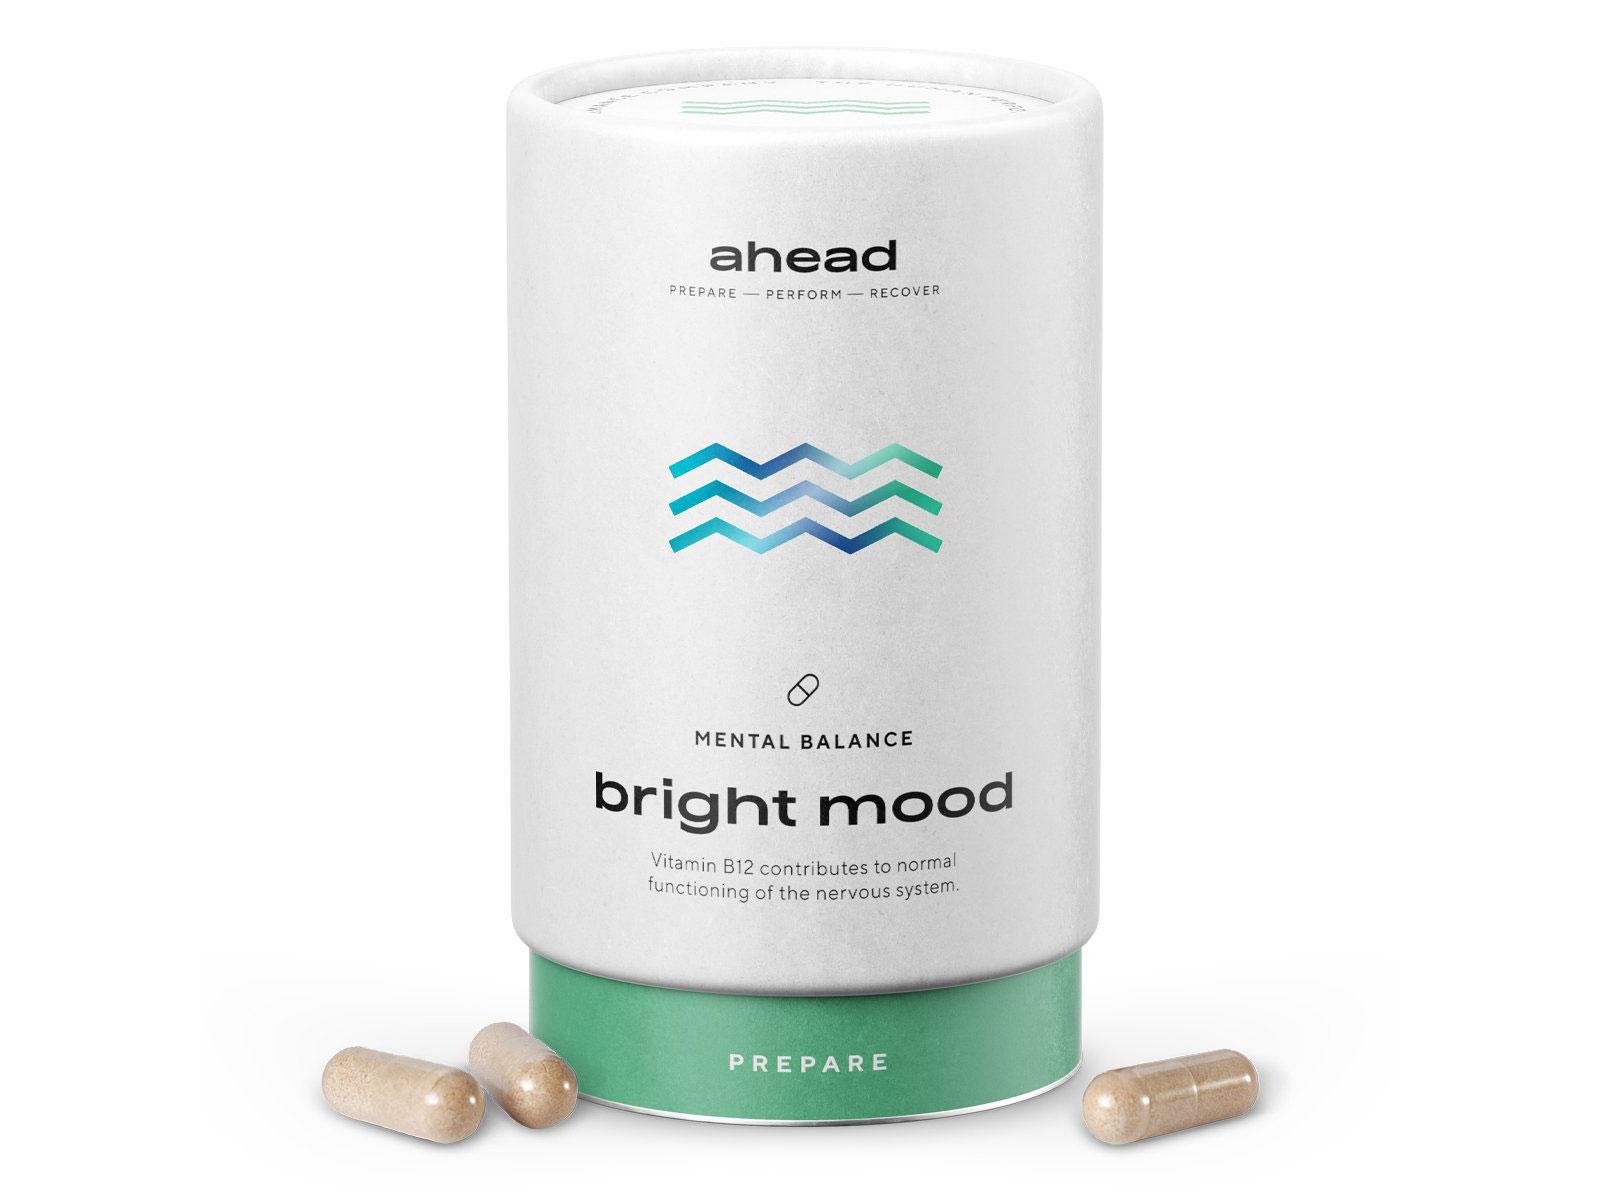 bright mood